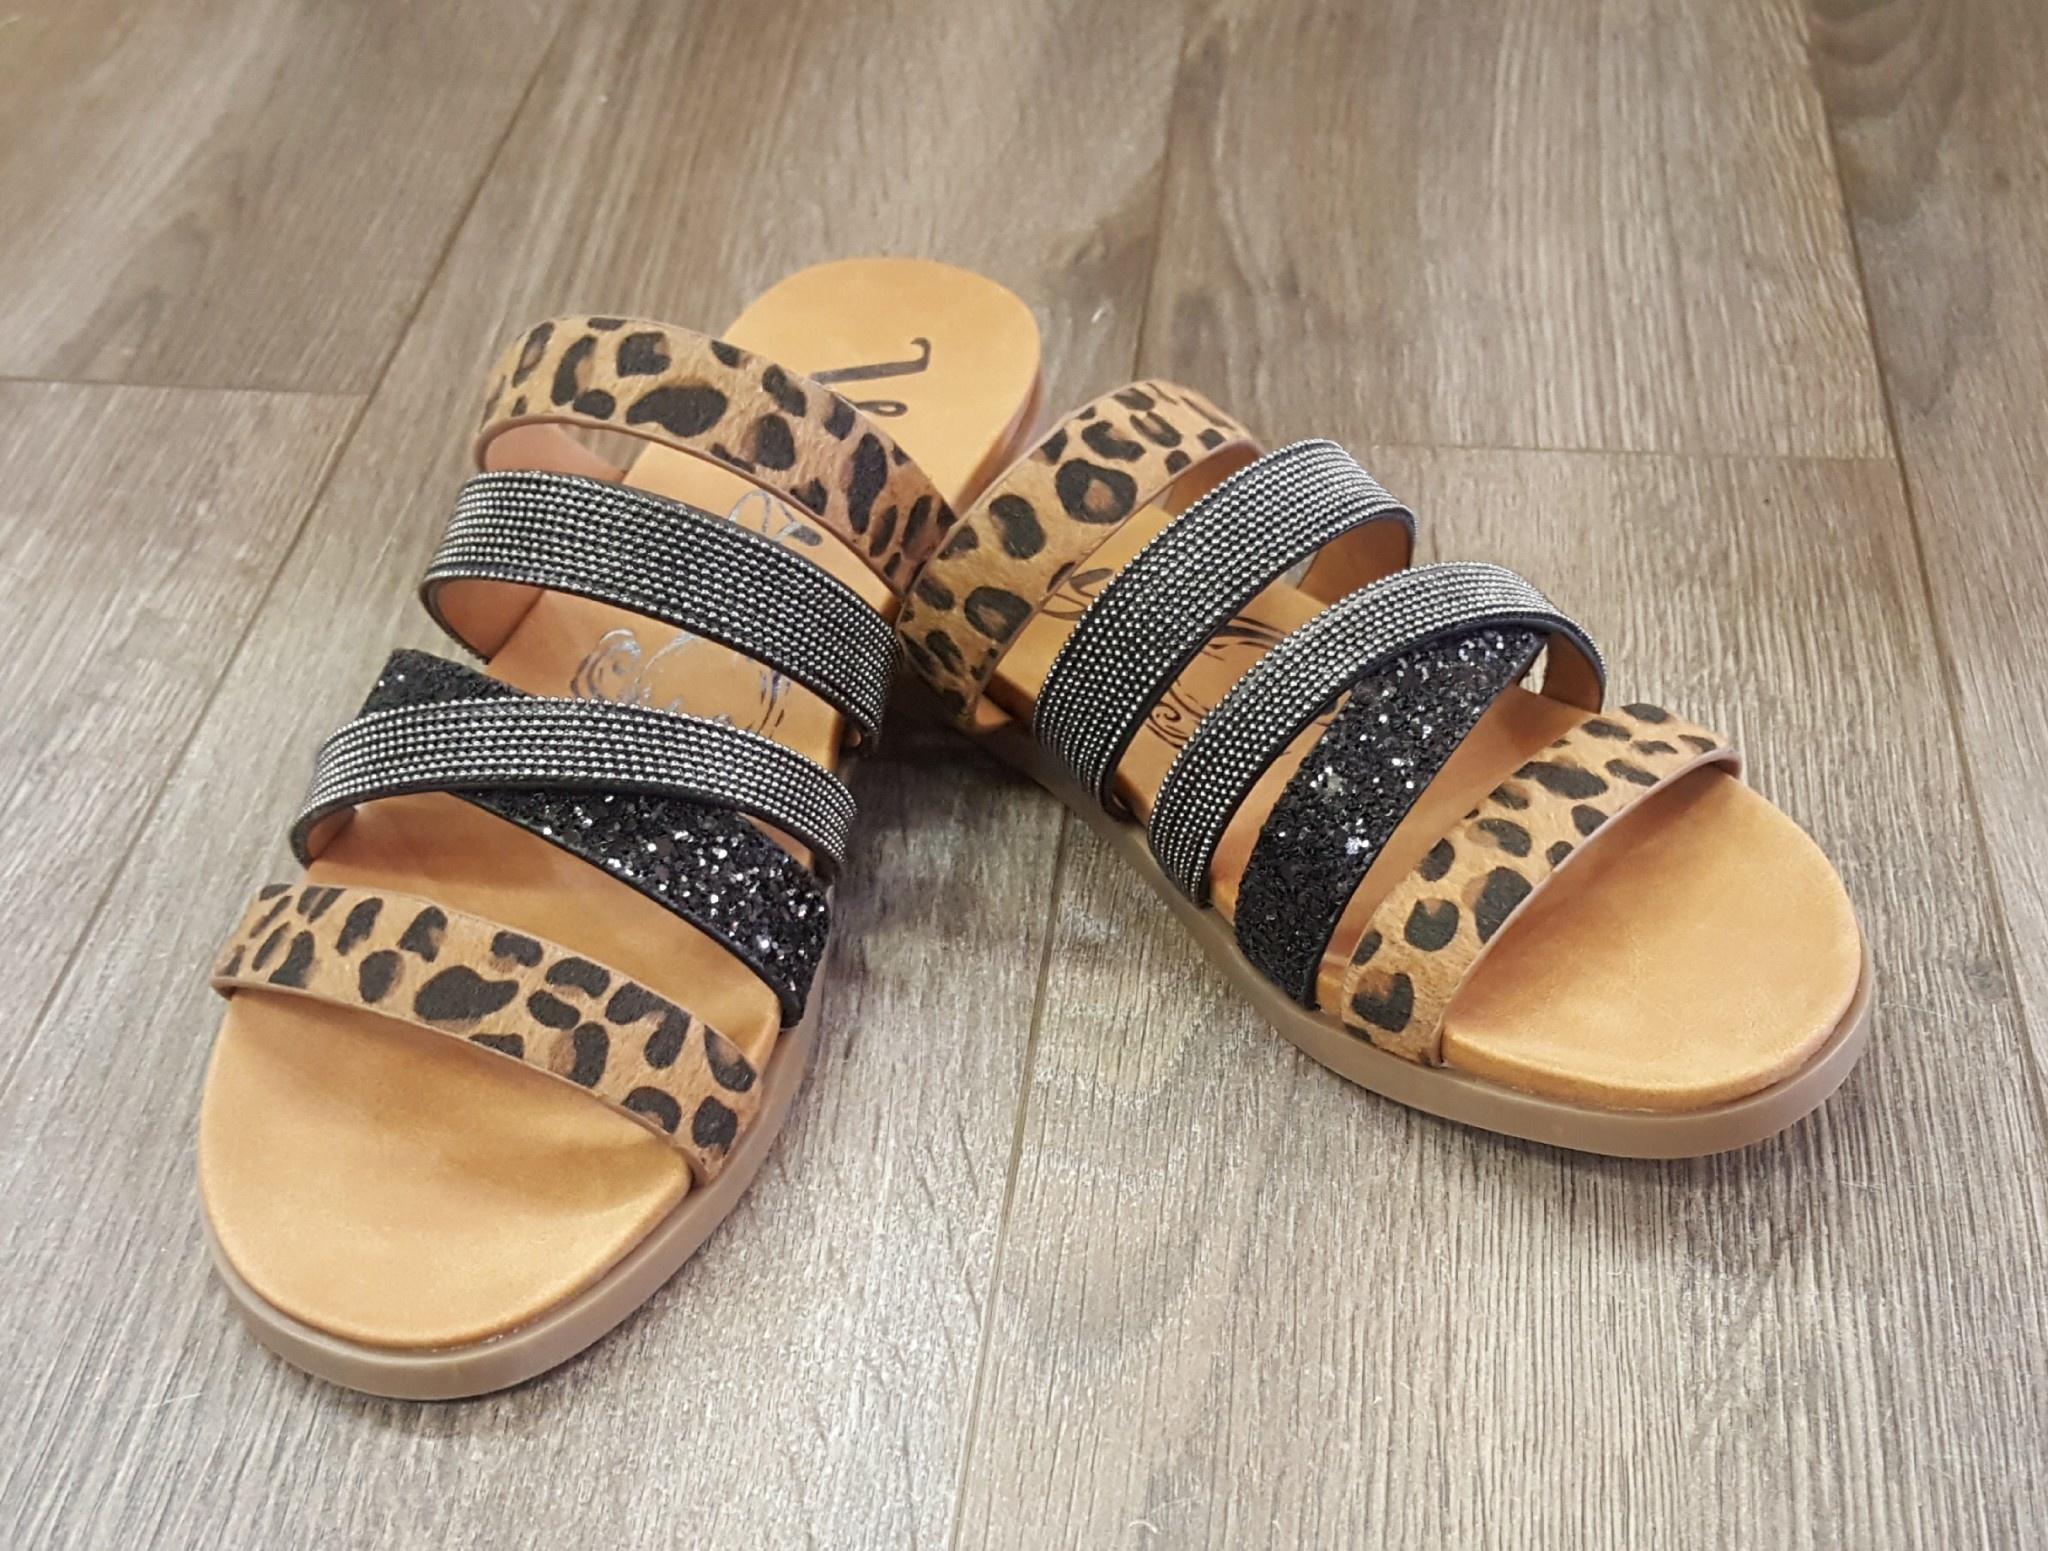 e5339eb0b12 Ginger Strappy Flat Sandal - Boutique 23